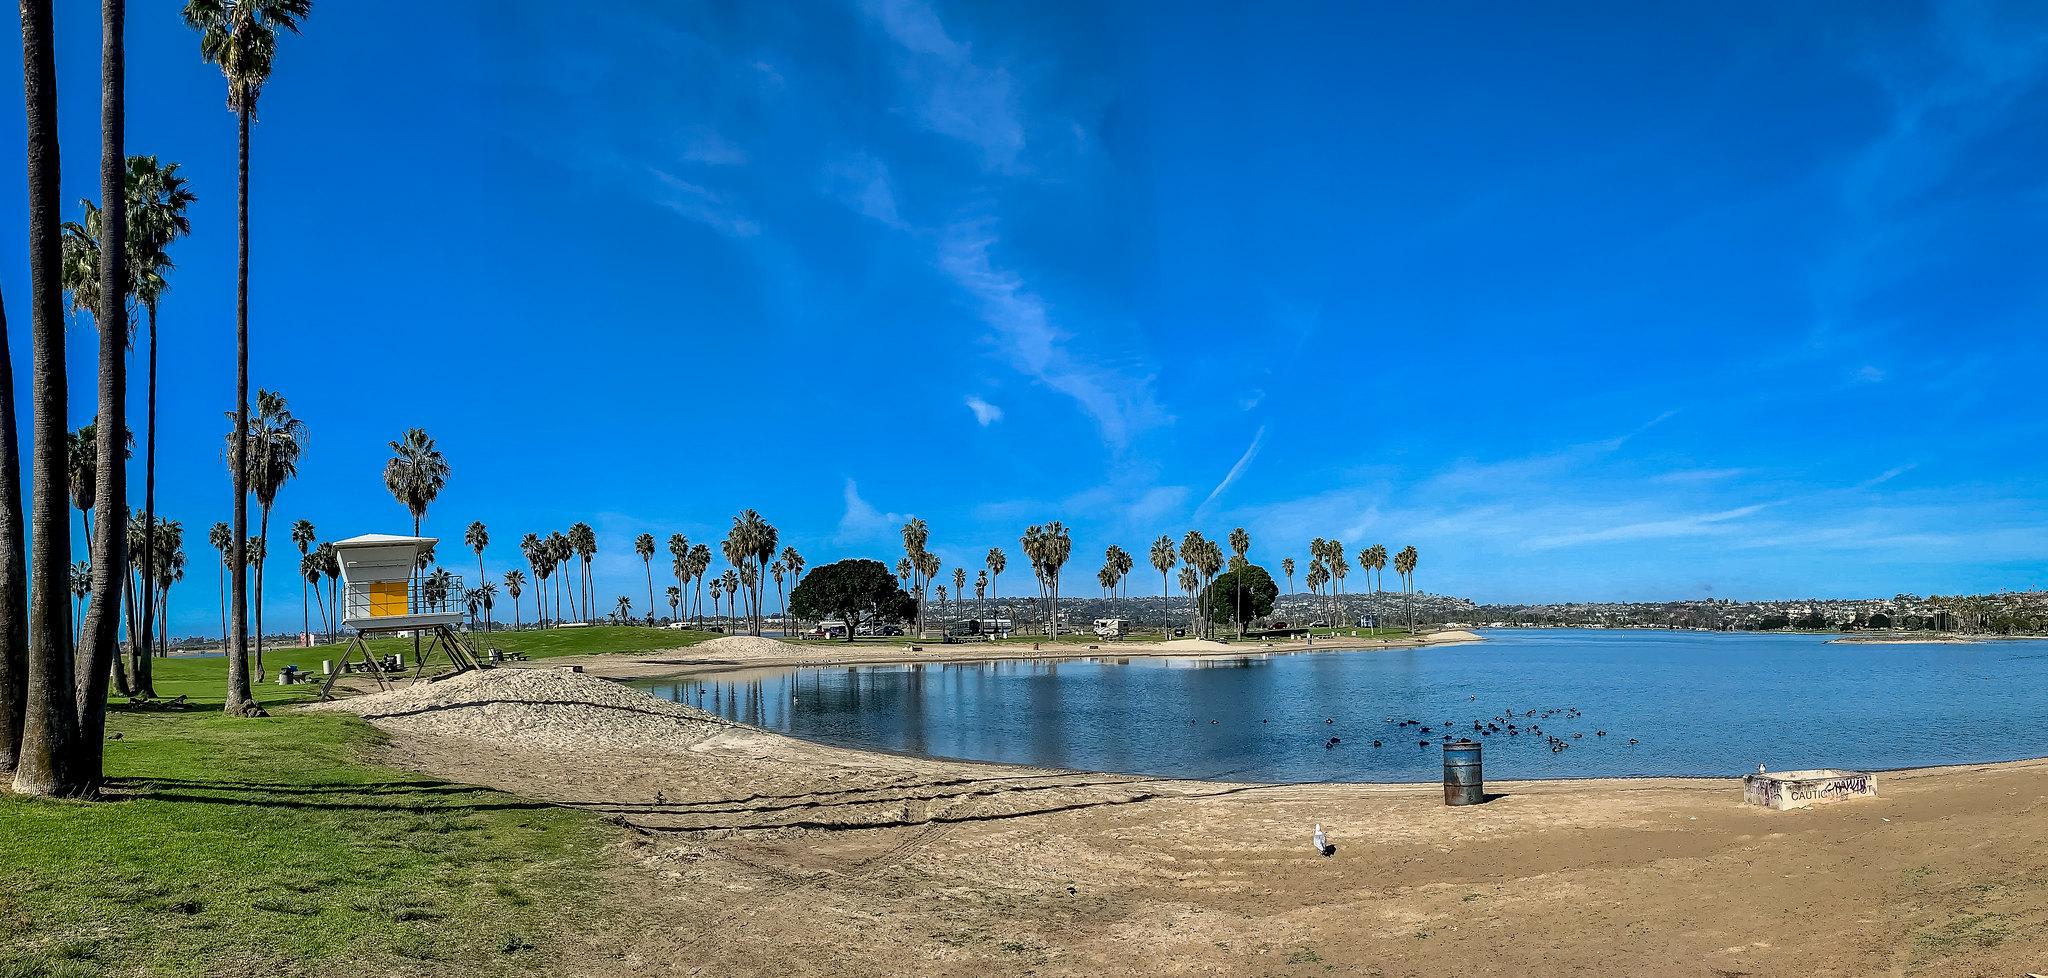 San Diego - Californie - [USA]